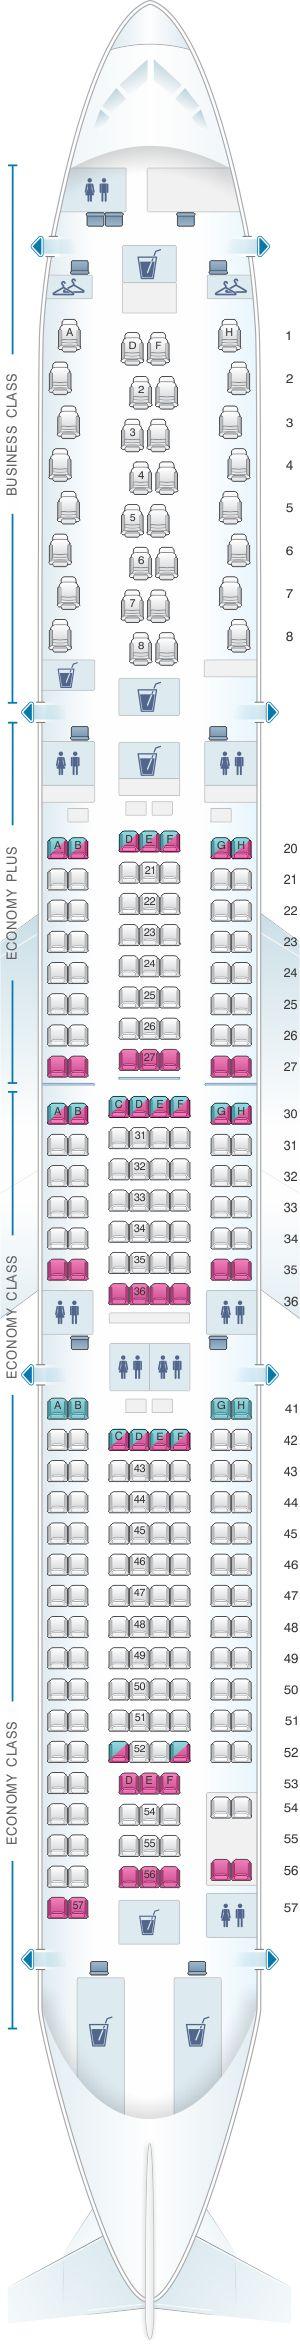 Seat Map Scandinavian Airlines (SAS) Airbus A330 300